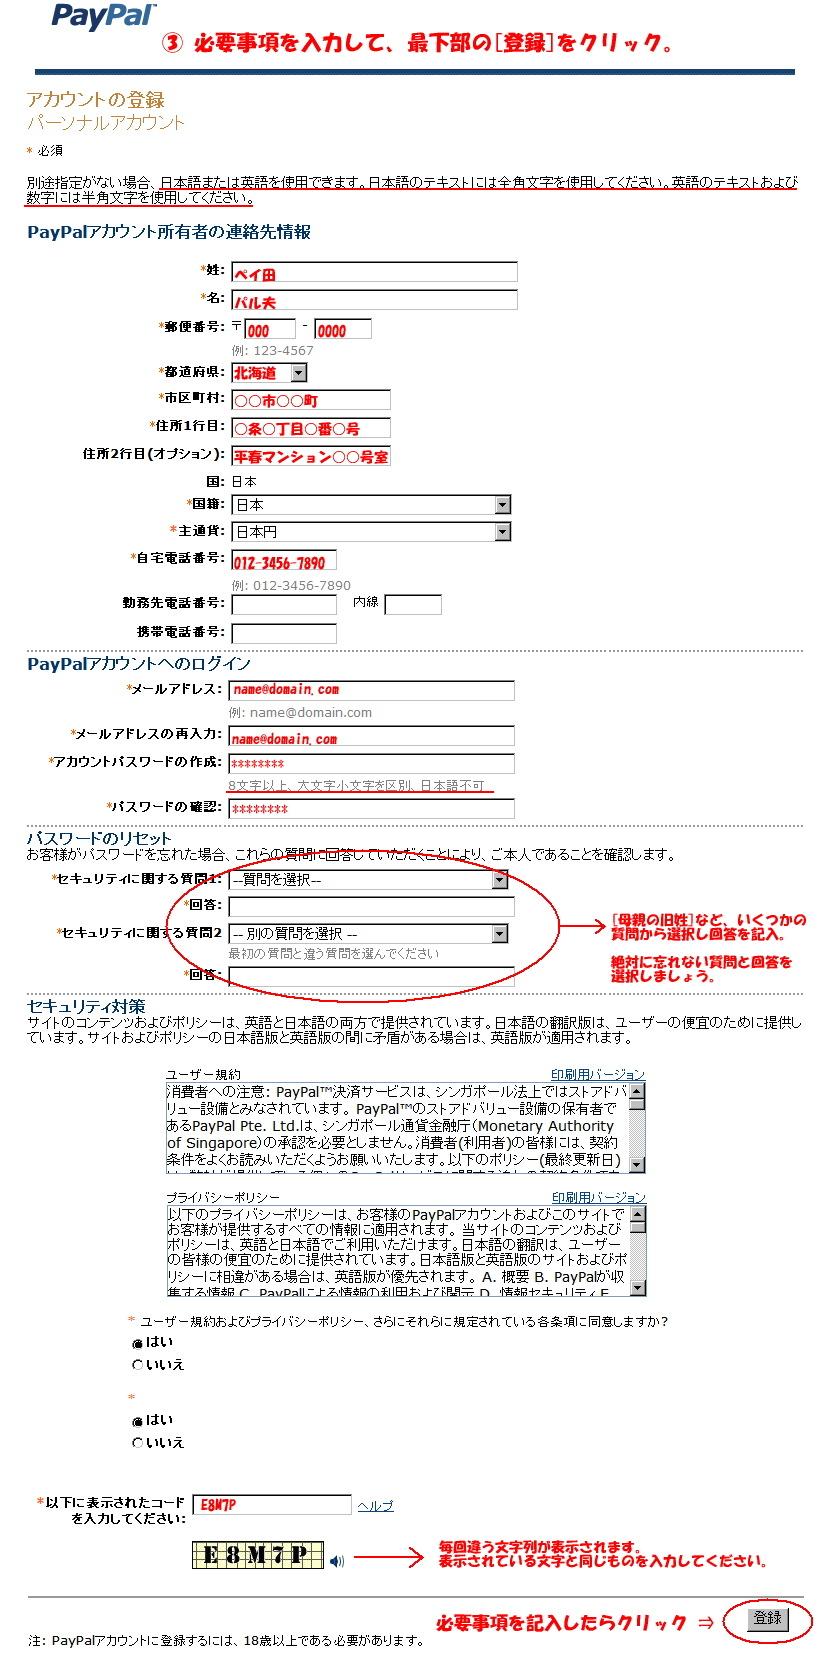 PayPalアカウント新規登録 手順3